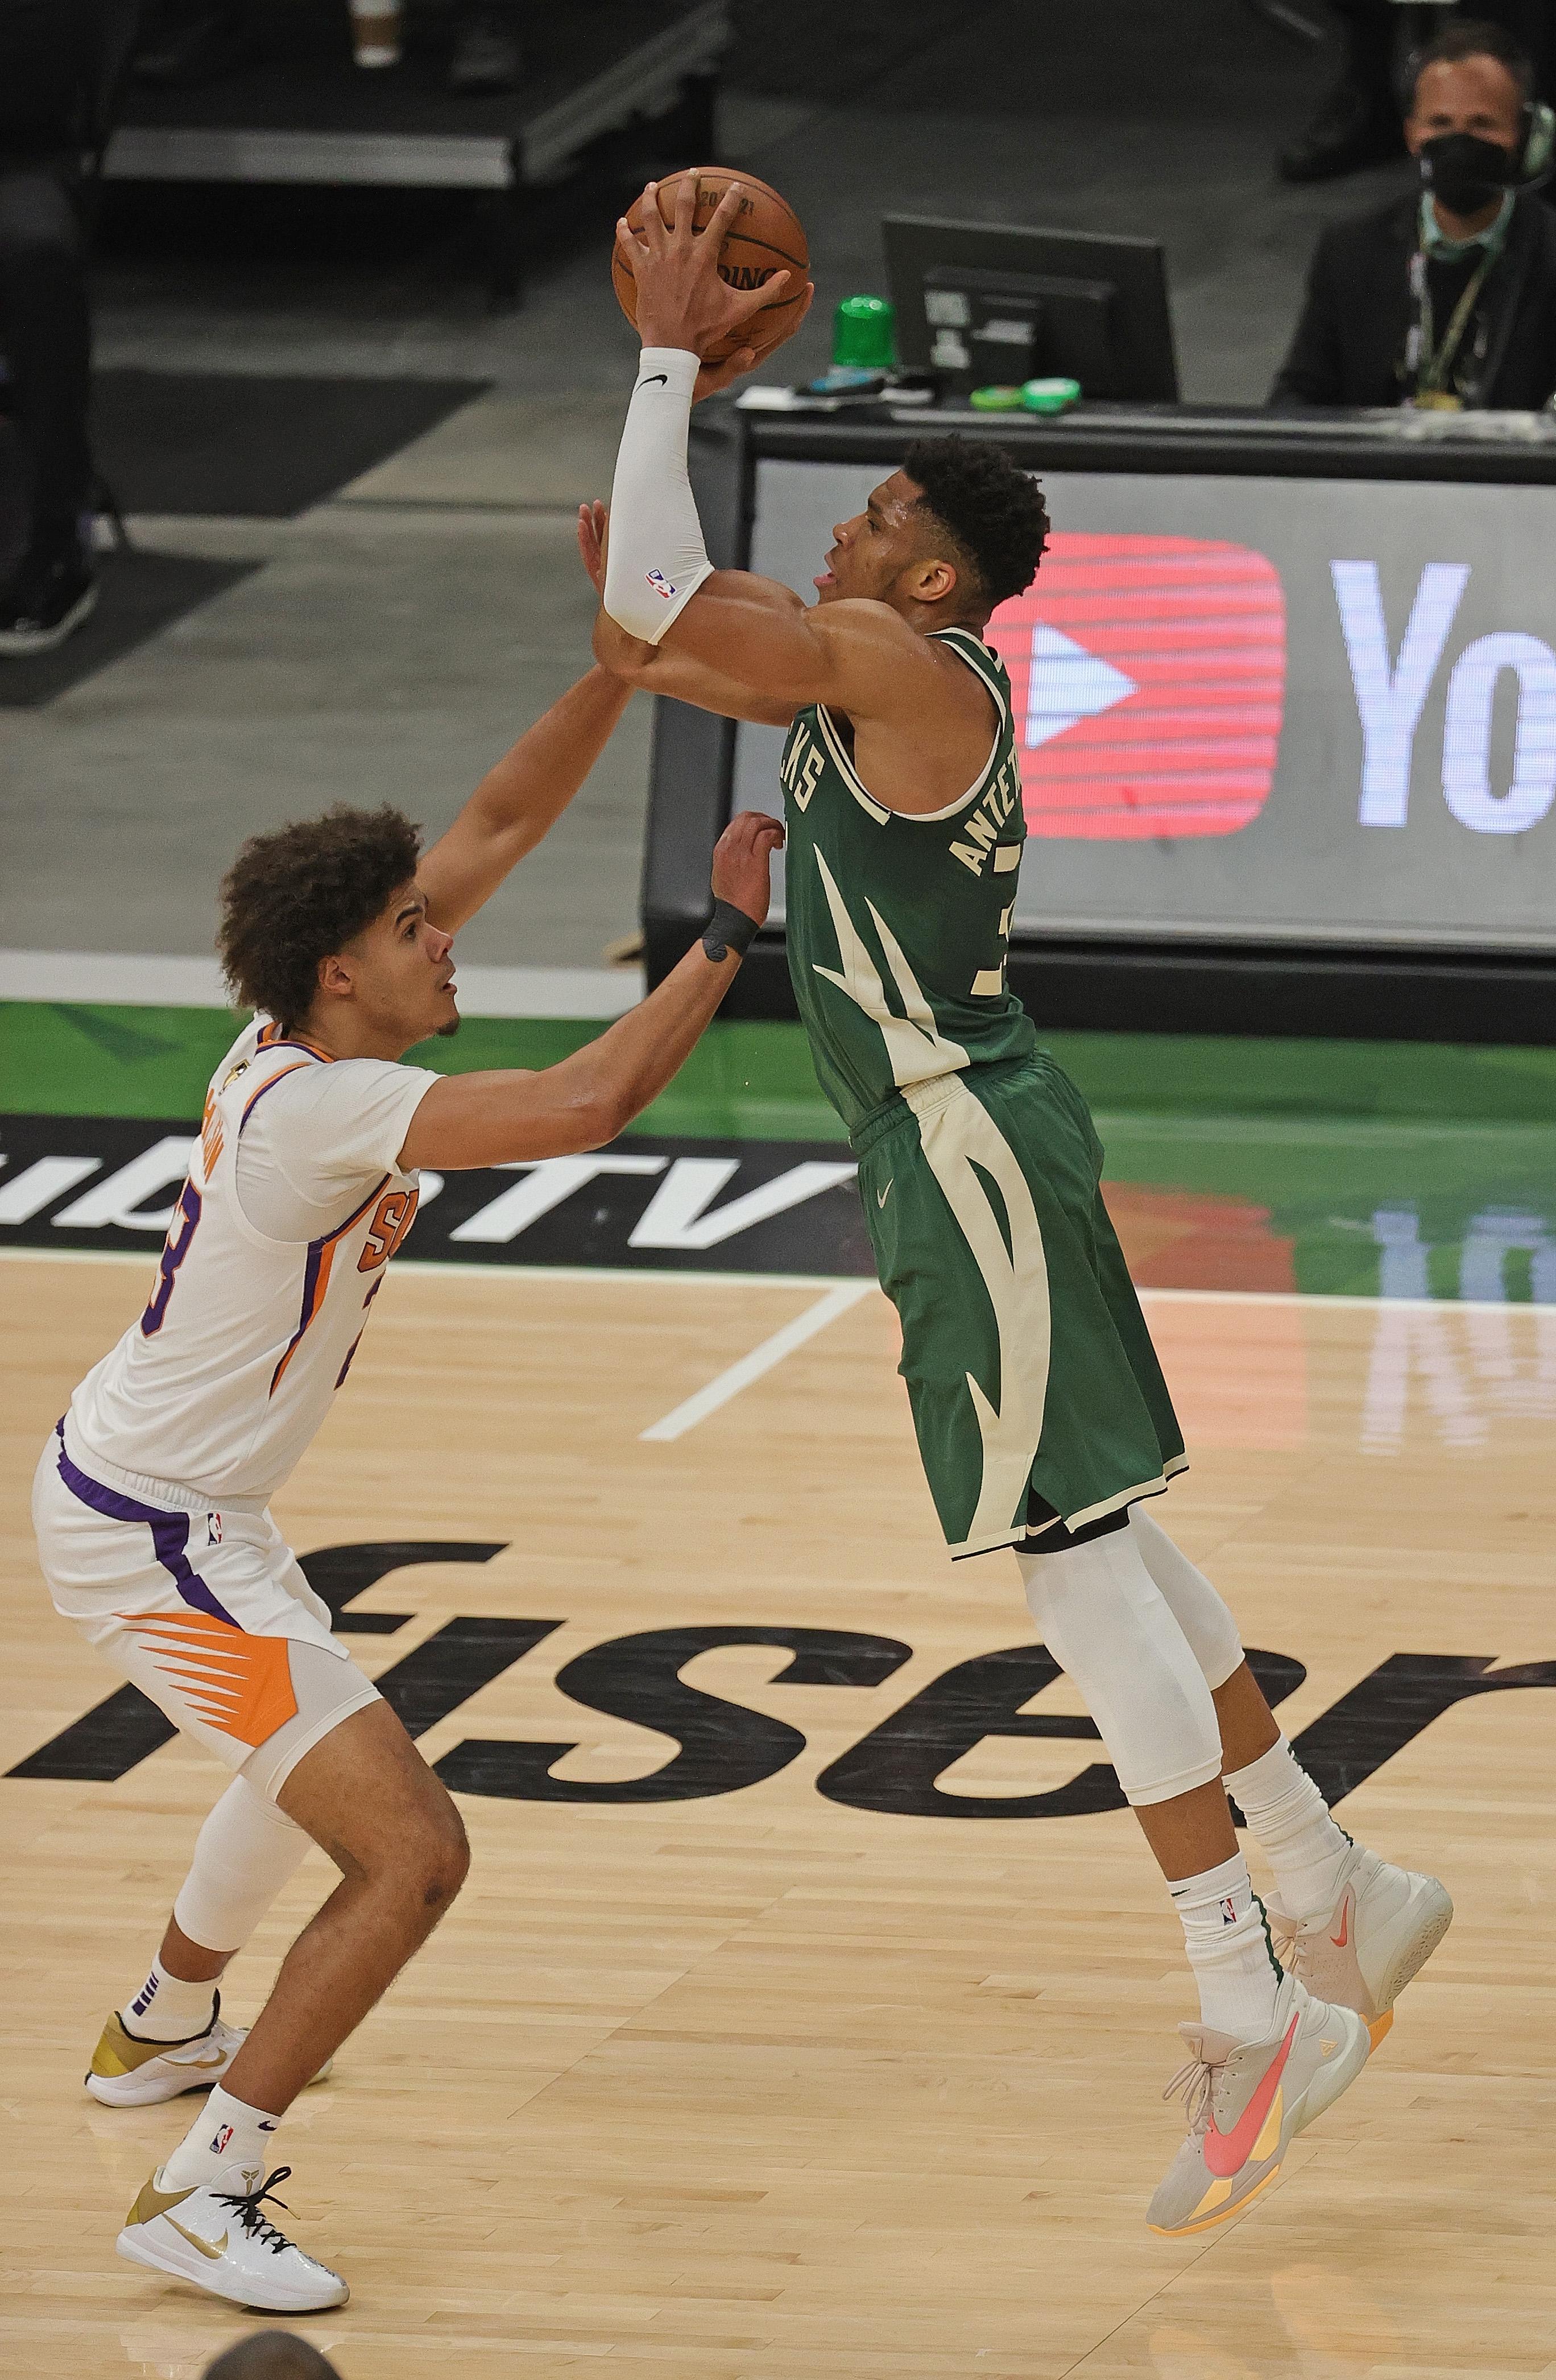 Giannis Antetokounmpo #34 of the Milwaukee Bucks shoots over Cameron Johnson #23 of the Phoenix Suns at Fiserv Forum on July 11, 2021 in Milwaukee, Wisconsin. The Bucks defeated the Suns 120-100.